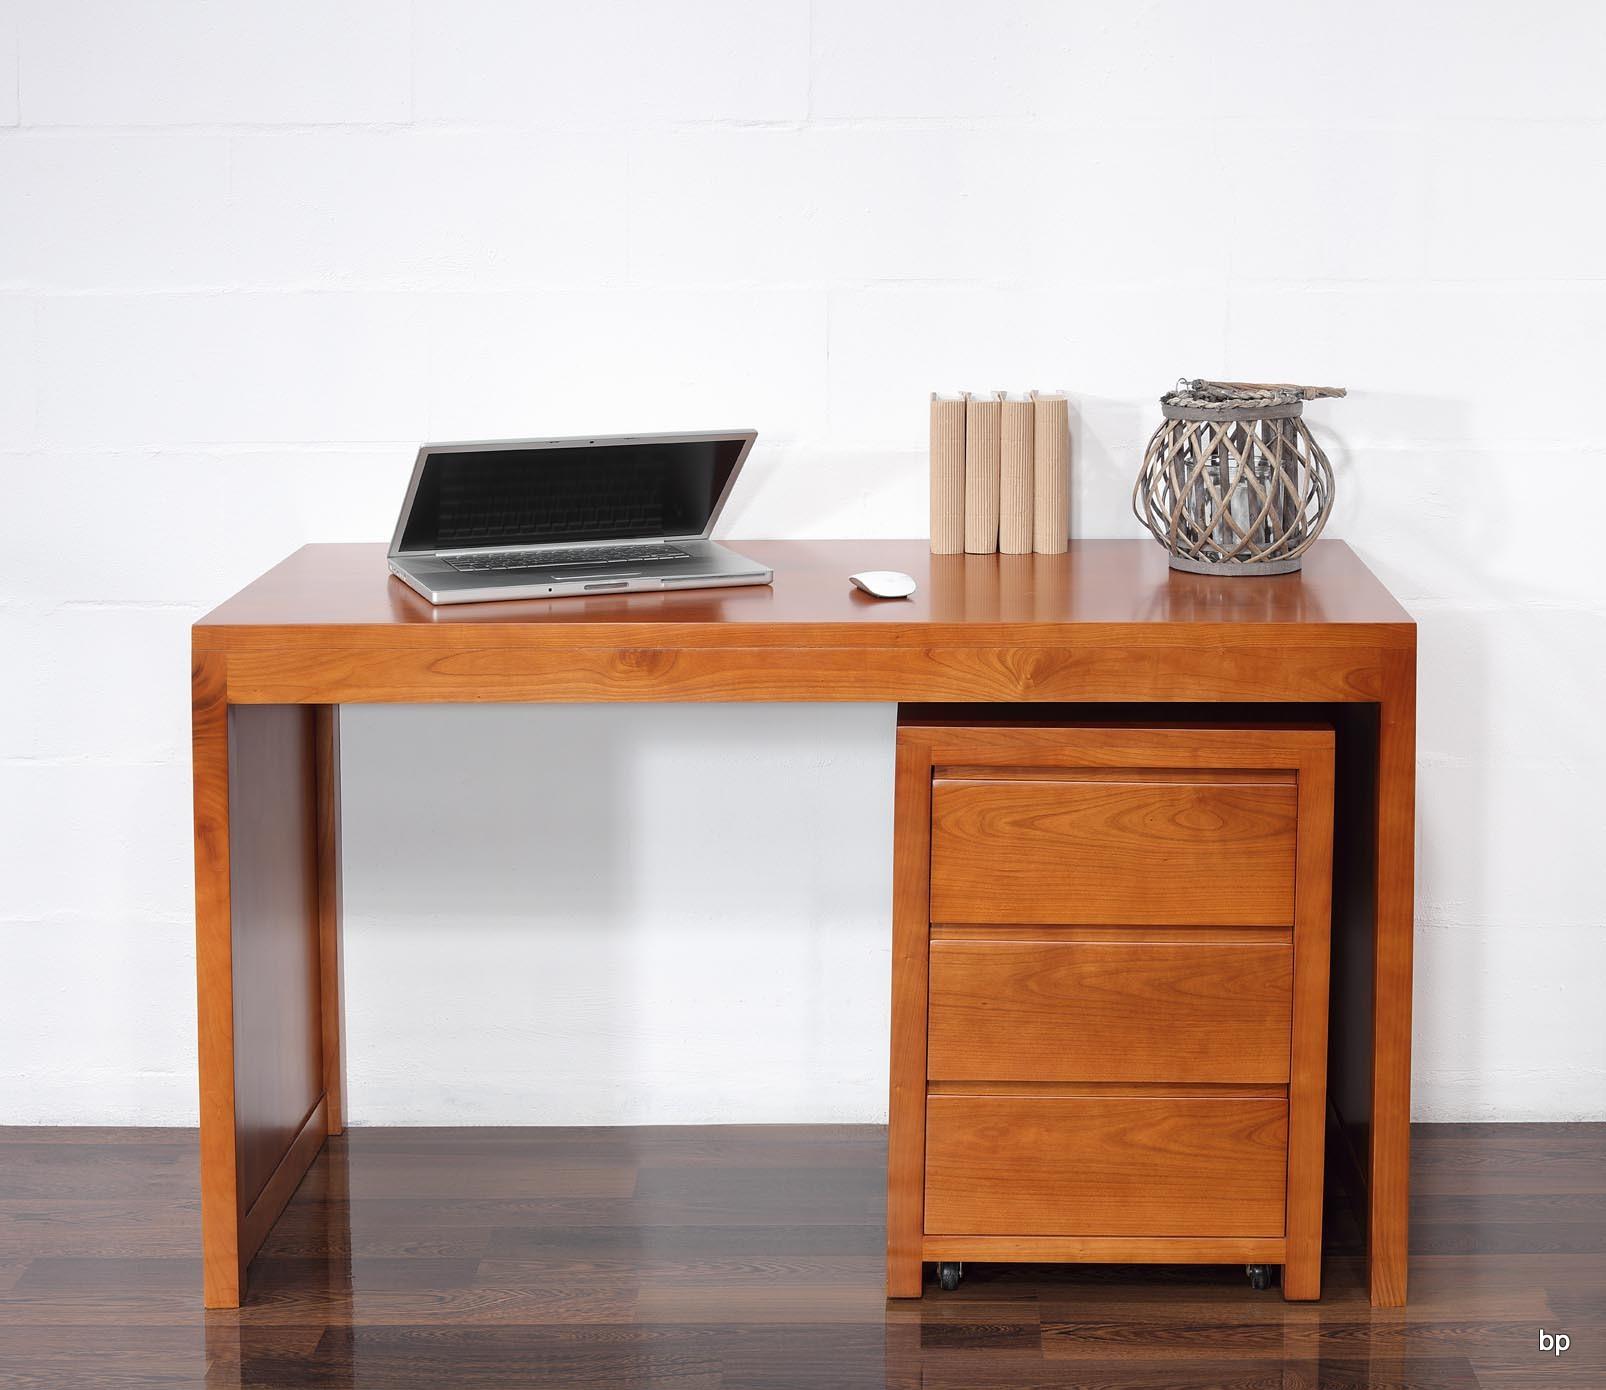 Mesa escritorio estilo contempor neo en madera cerezo macizo con modulo con ruedas de 3 cajones - Mesa escritorio madera ...